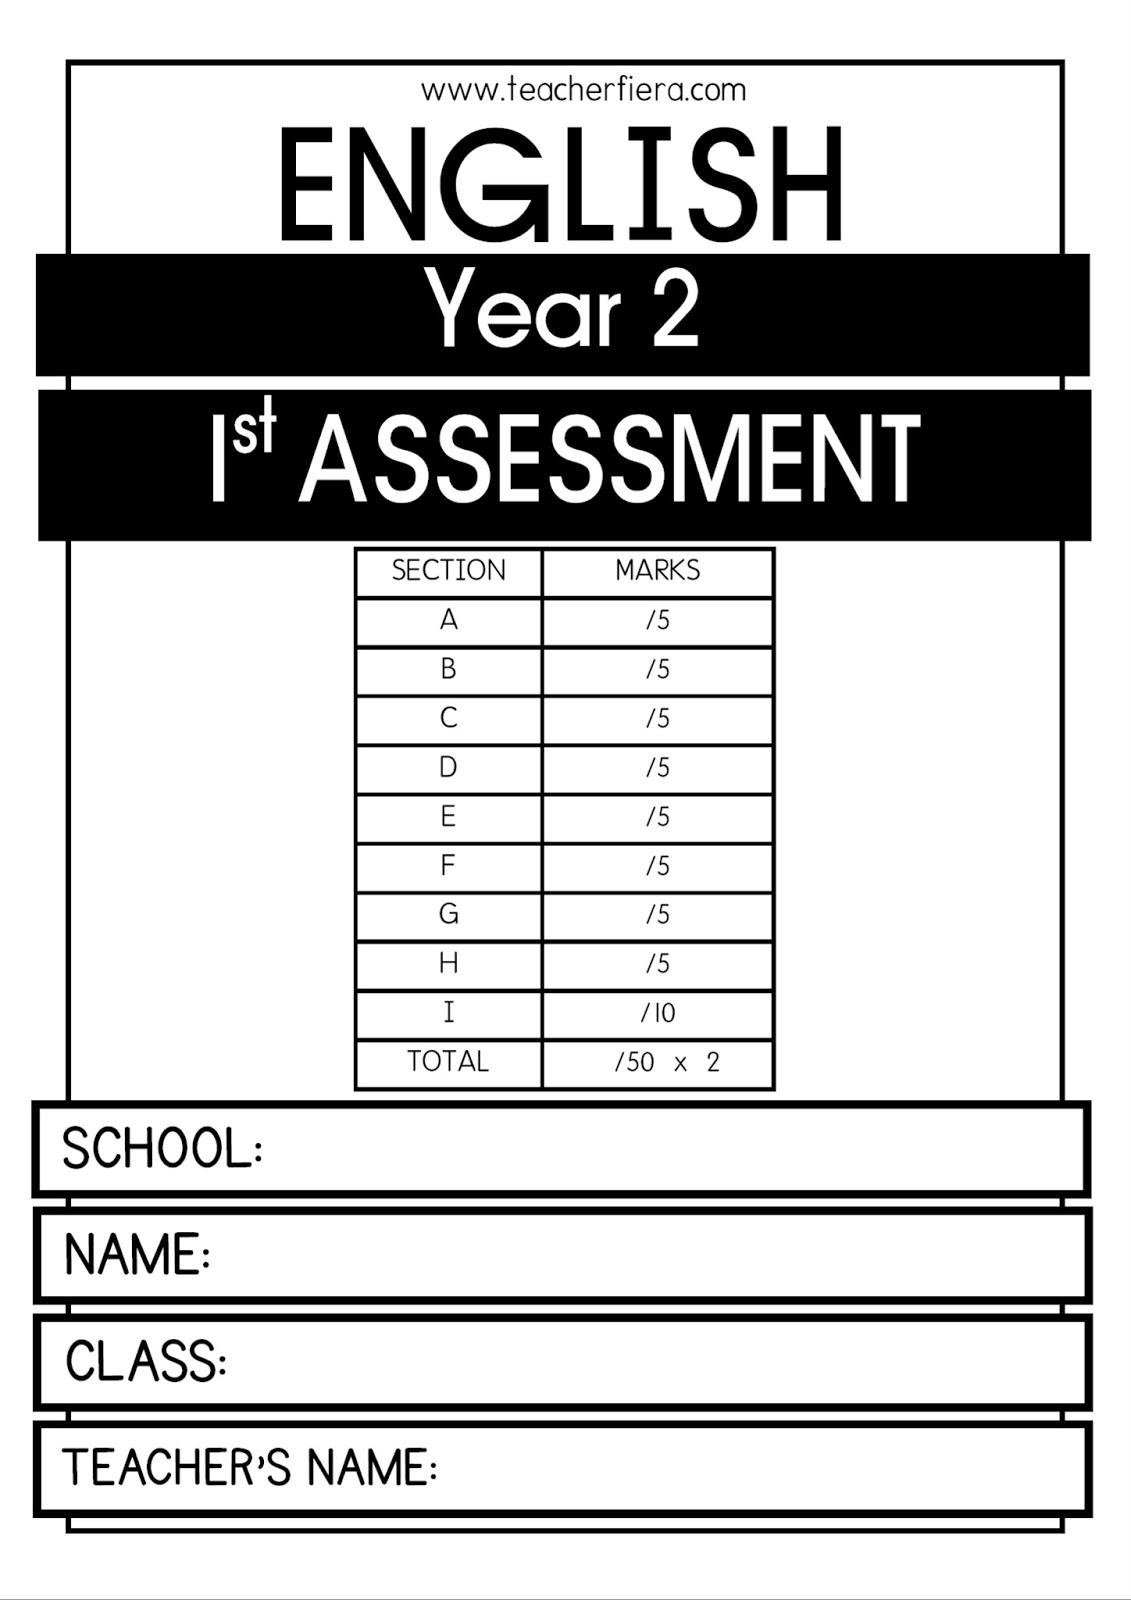 Teacher Fiera S Assemblage